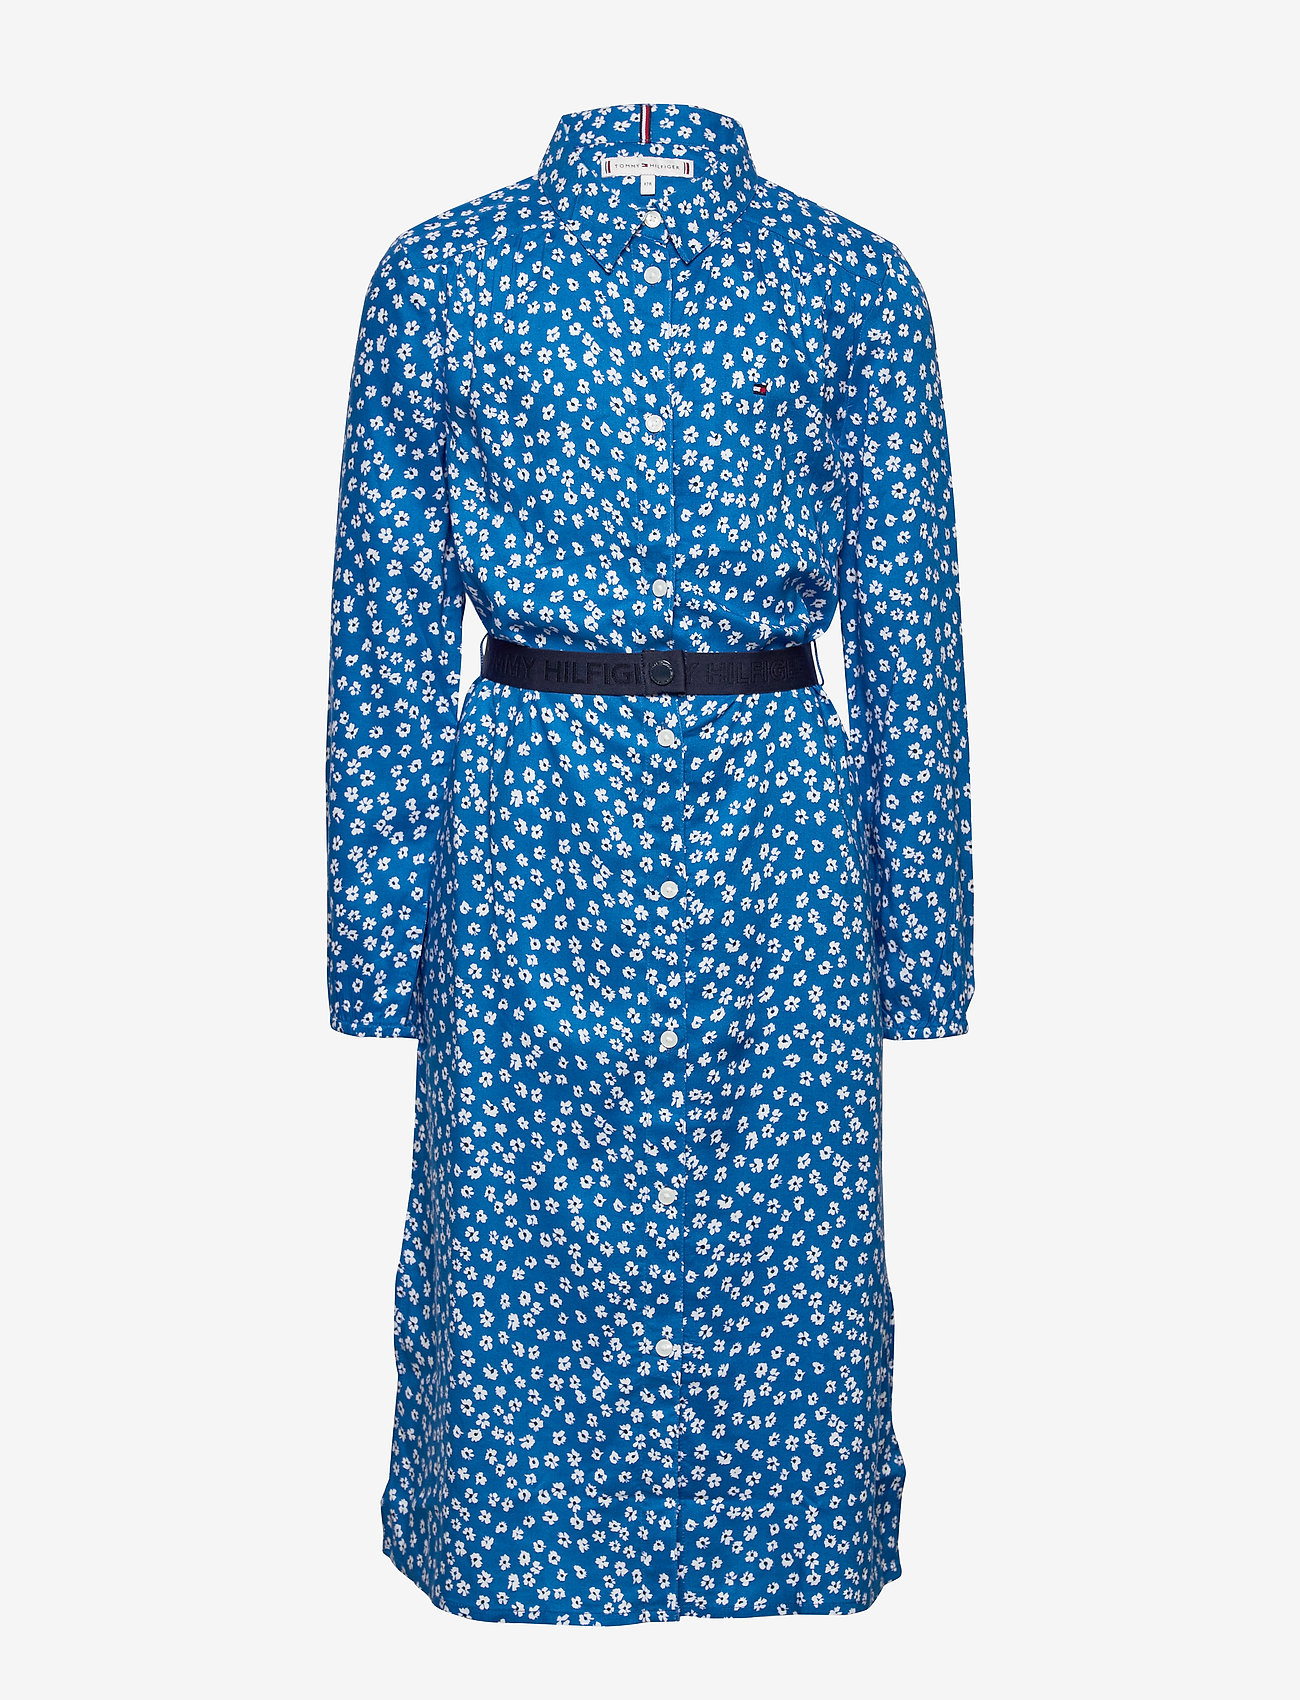 Tommy Hilfiger - DITSY FLOWER PRINT DRESS S/S - robes - dynamic blue/ ditsy flower - 0